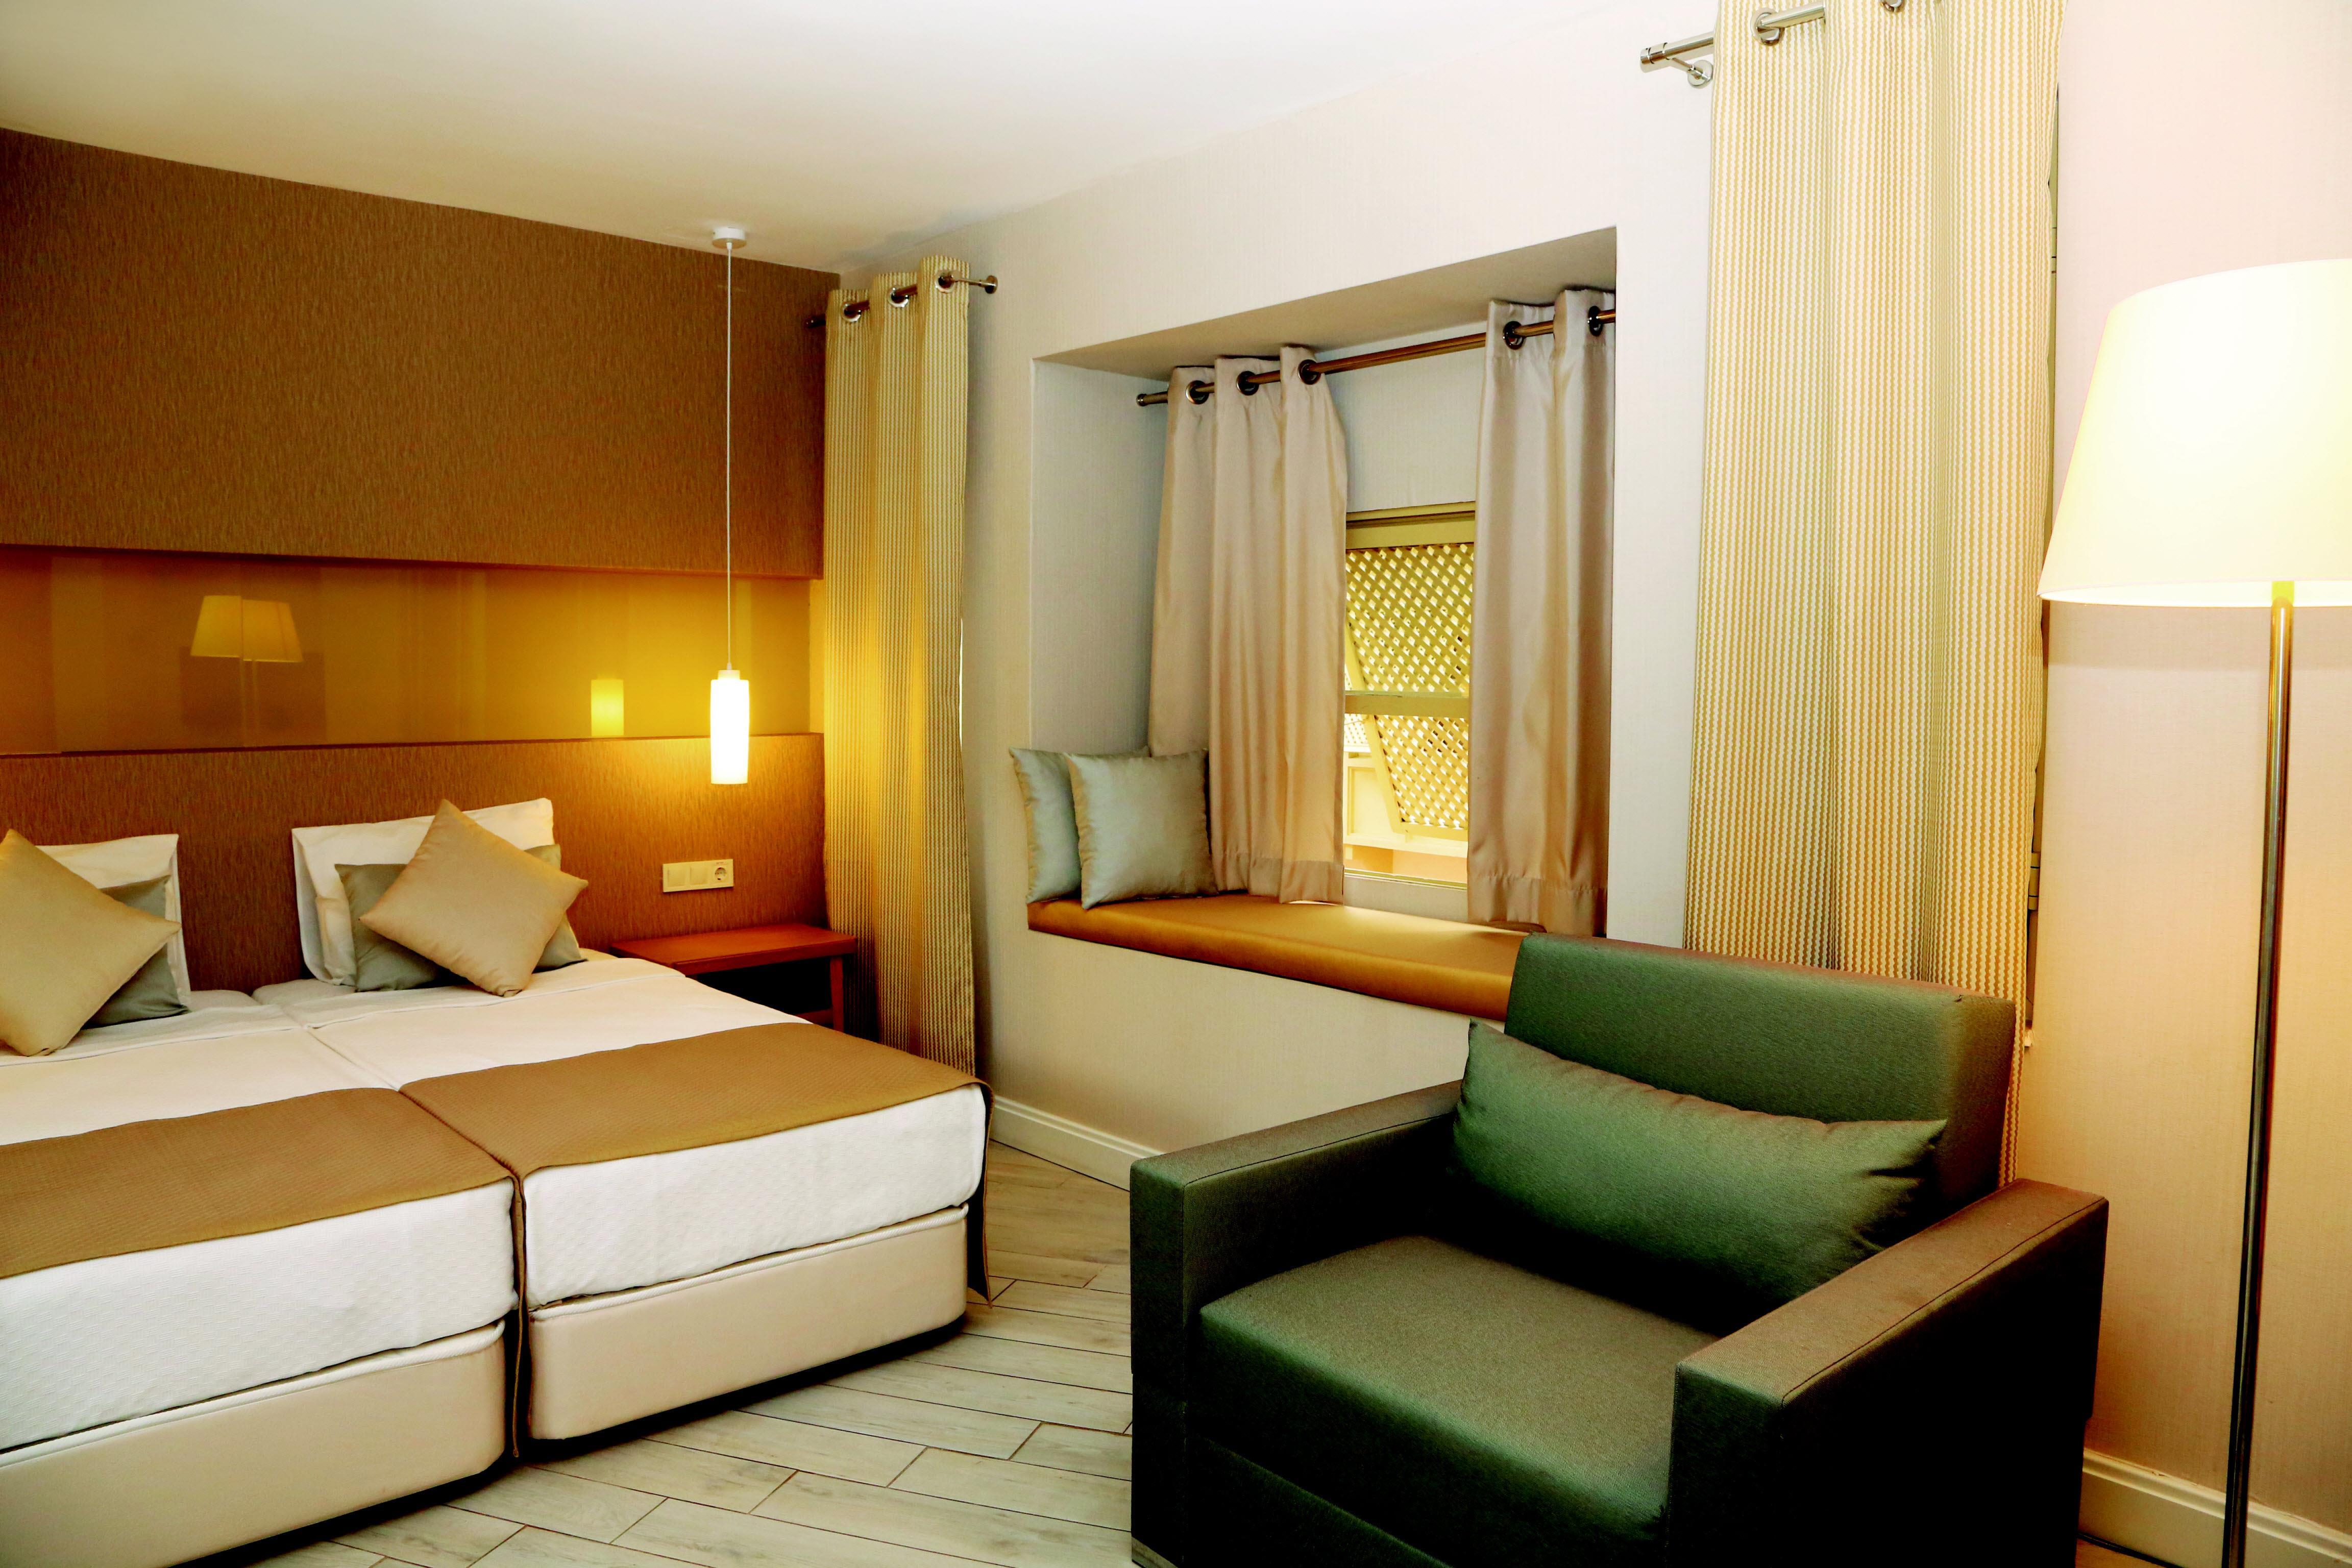 http://www.orextravel.sk/OREX/hotelphotos/ulusoy-kemer-holiday-club-area-0015.jpg